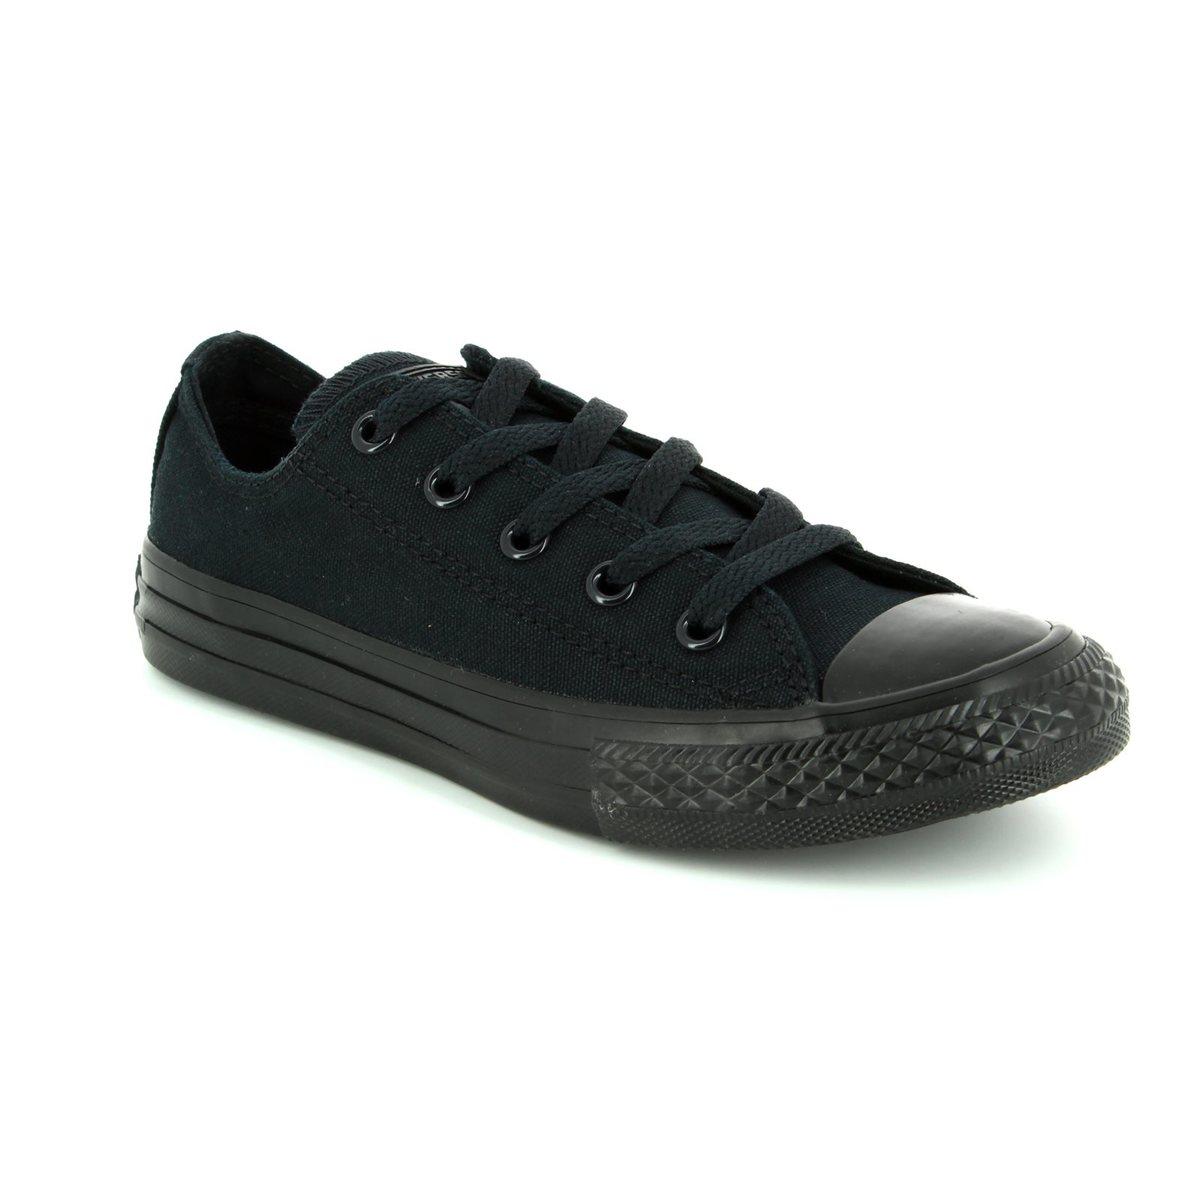 5b80fba21cffd3 Converse Trainers - Black - 314786C All Star Ox Black Monochrome